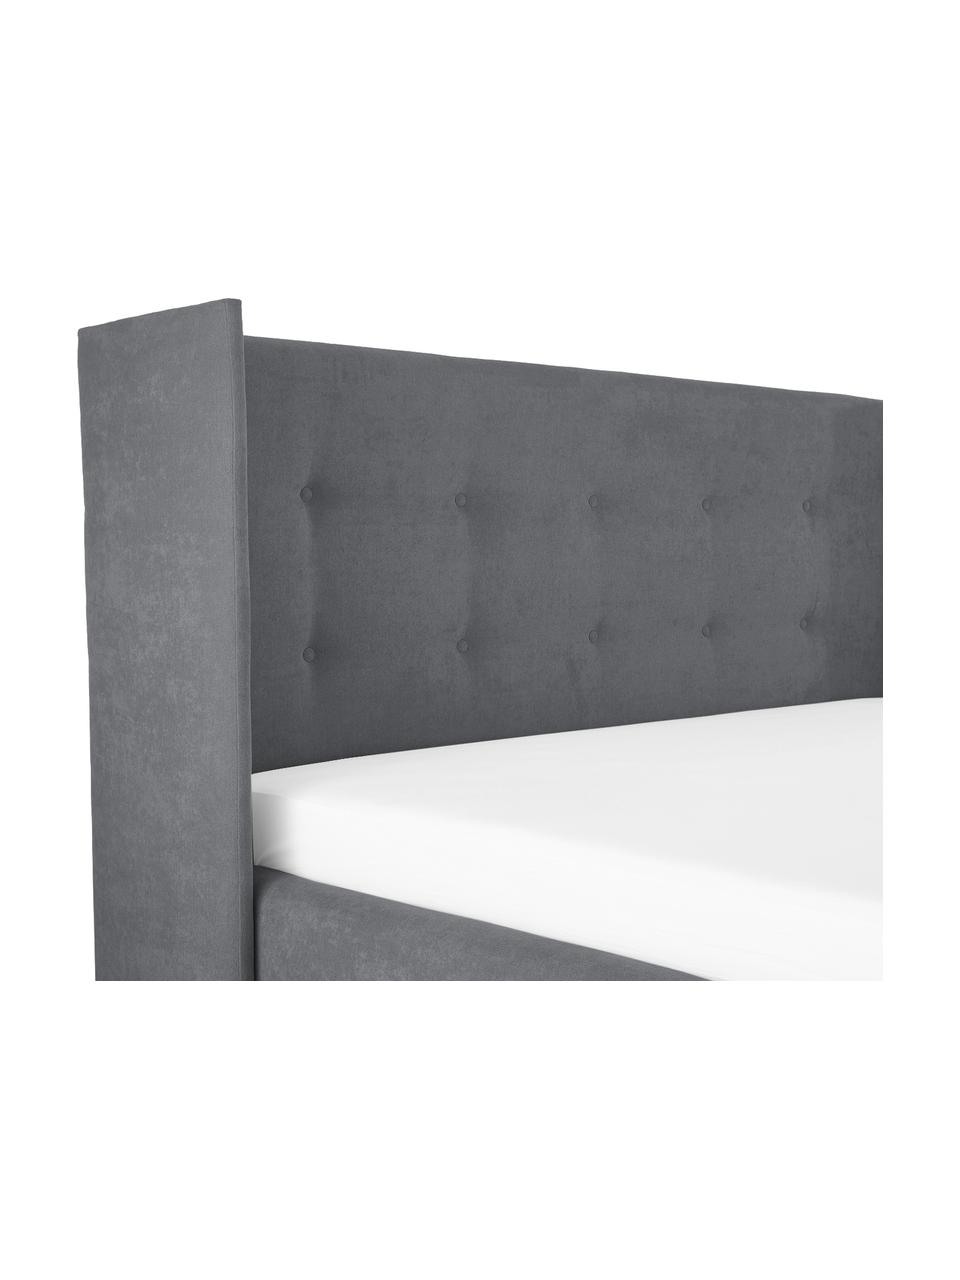 Łóżko tapicerowane Star, Korpus: lite drewno sosnowe, Tapicerka: poliester (materiał tekst, Ciemny szary, 180 x 200 cm